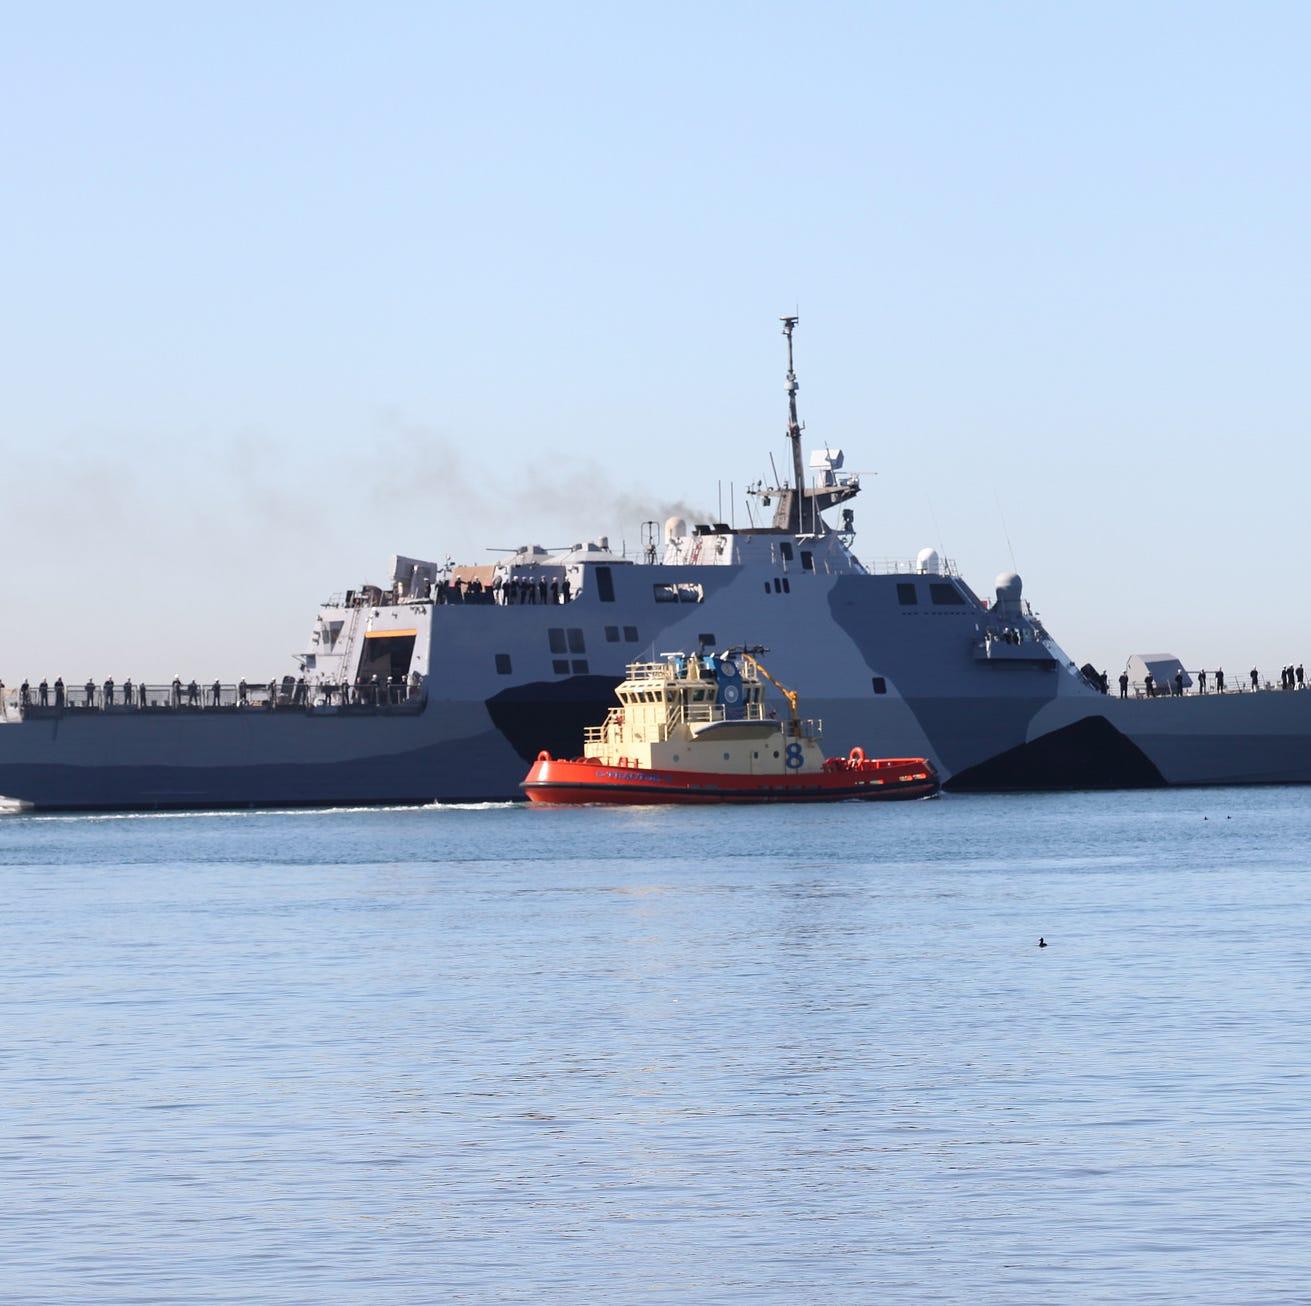 USS Cooperstown construction gets underway as Congress funds LCS program